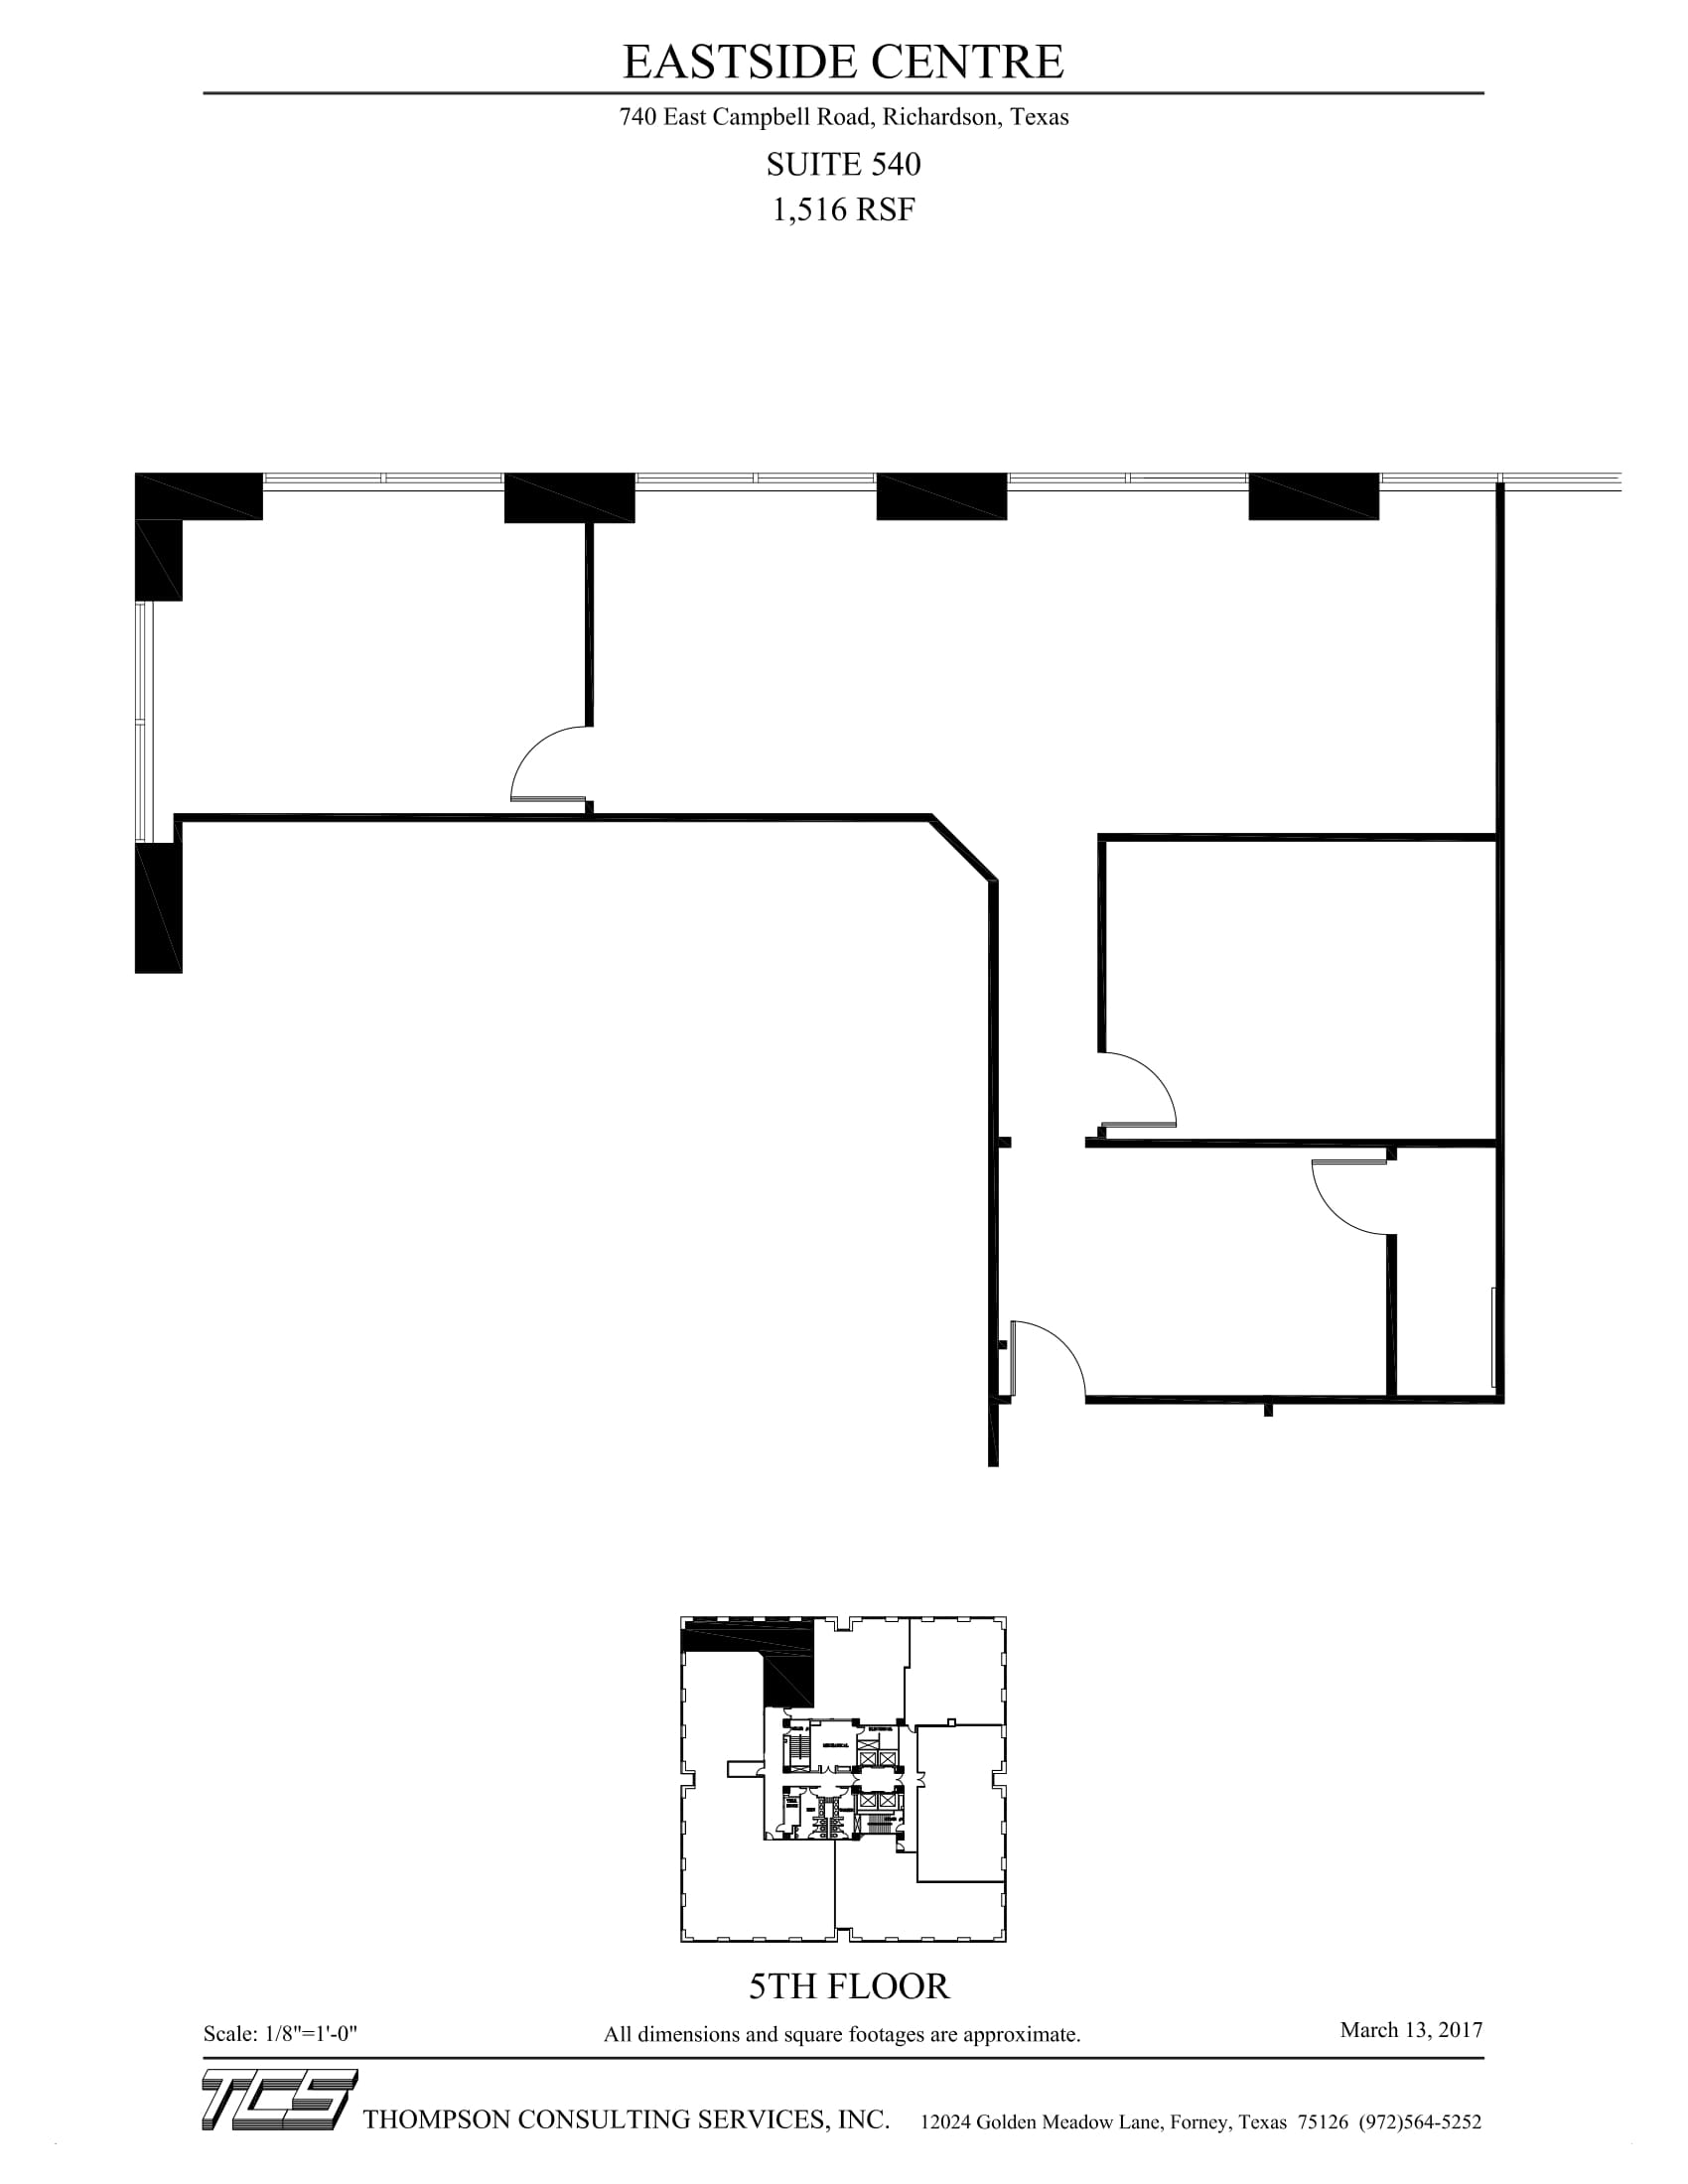 Eastside Centre - Suite 540 - Marketing Plan (3-13-17)-1